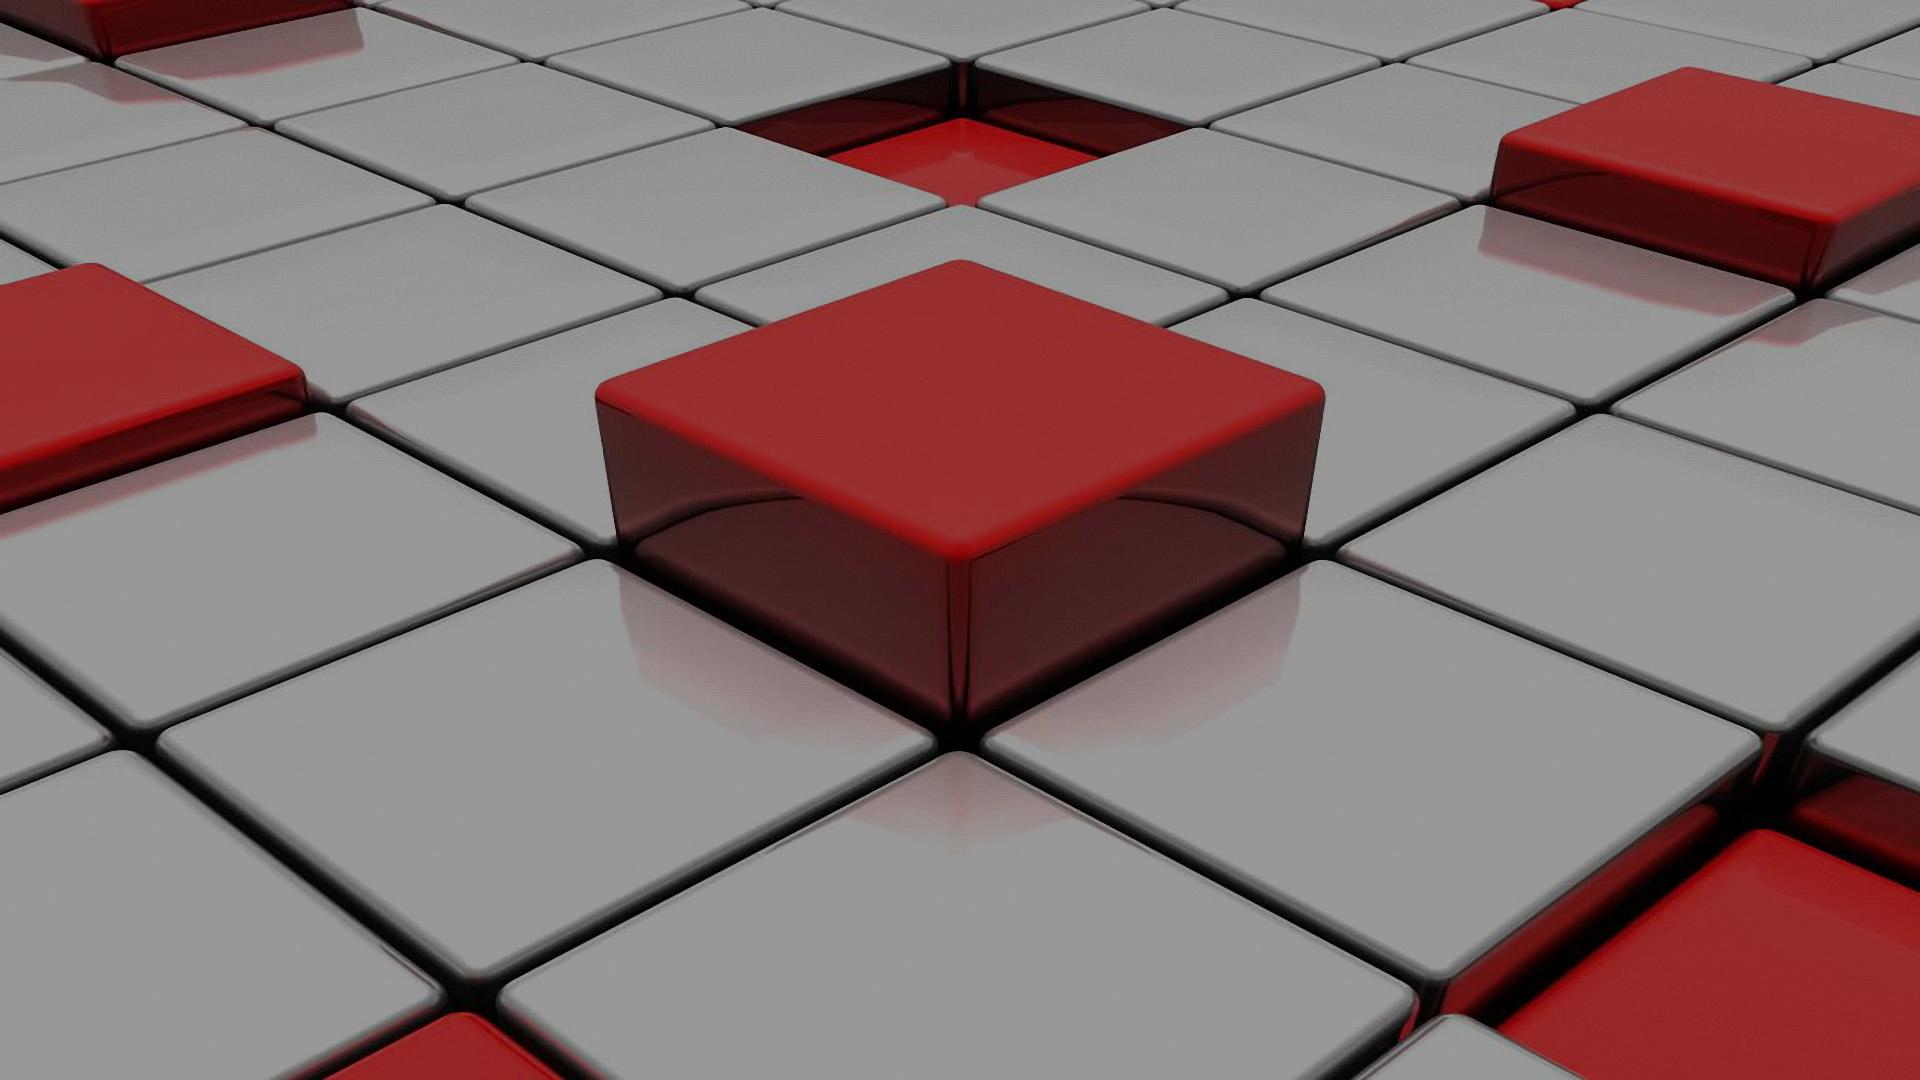 hd-pics-photos-3d-cubes-white-red-technology-digital-hd ...